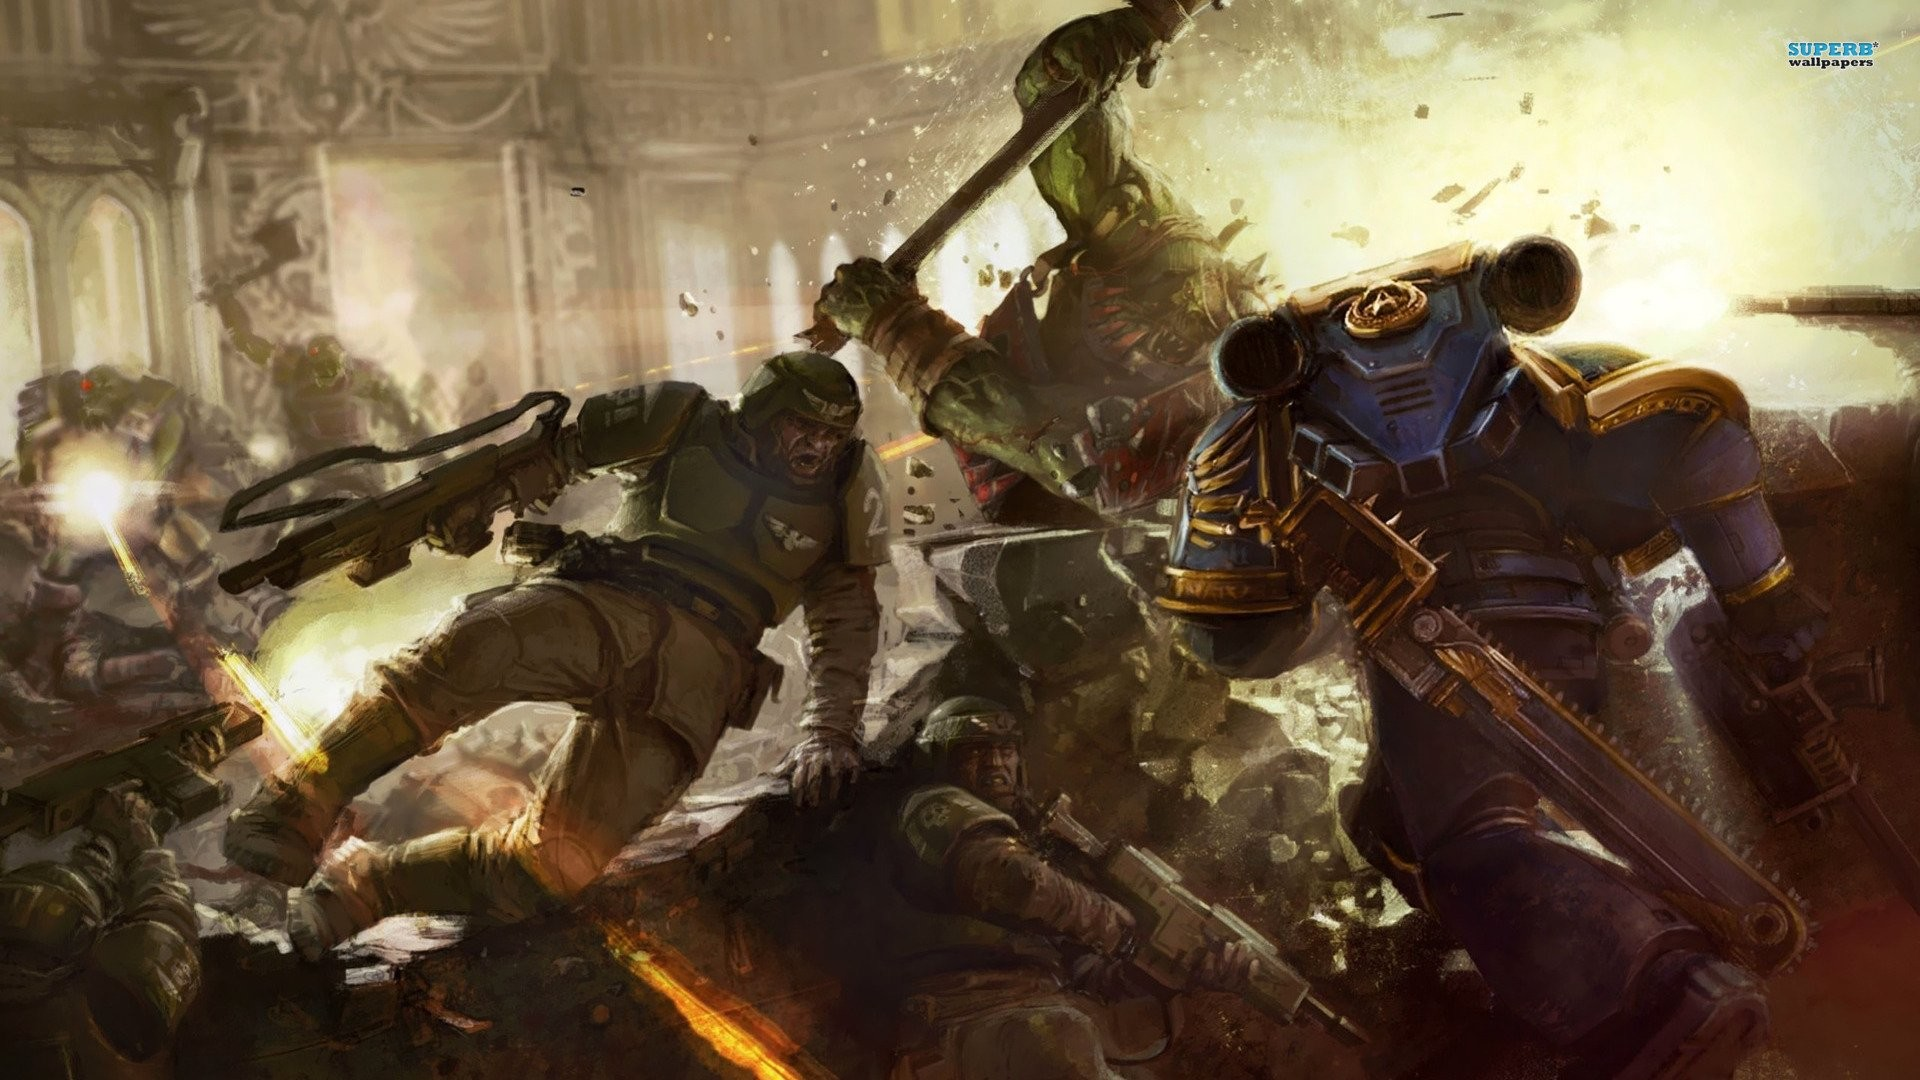 Warhammer Space Marine Combat HD desktop wallpaper 1920×1080